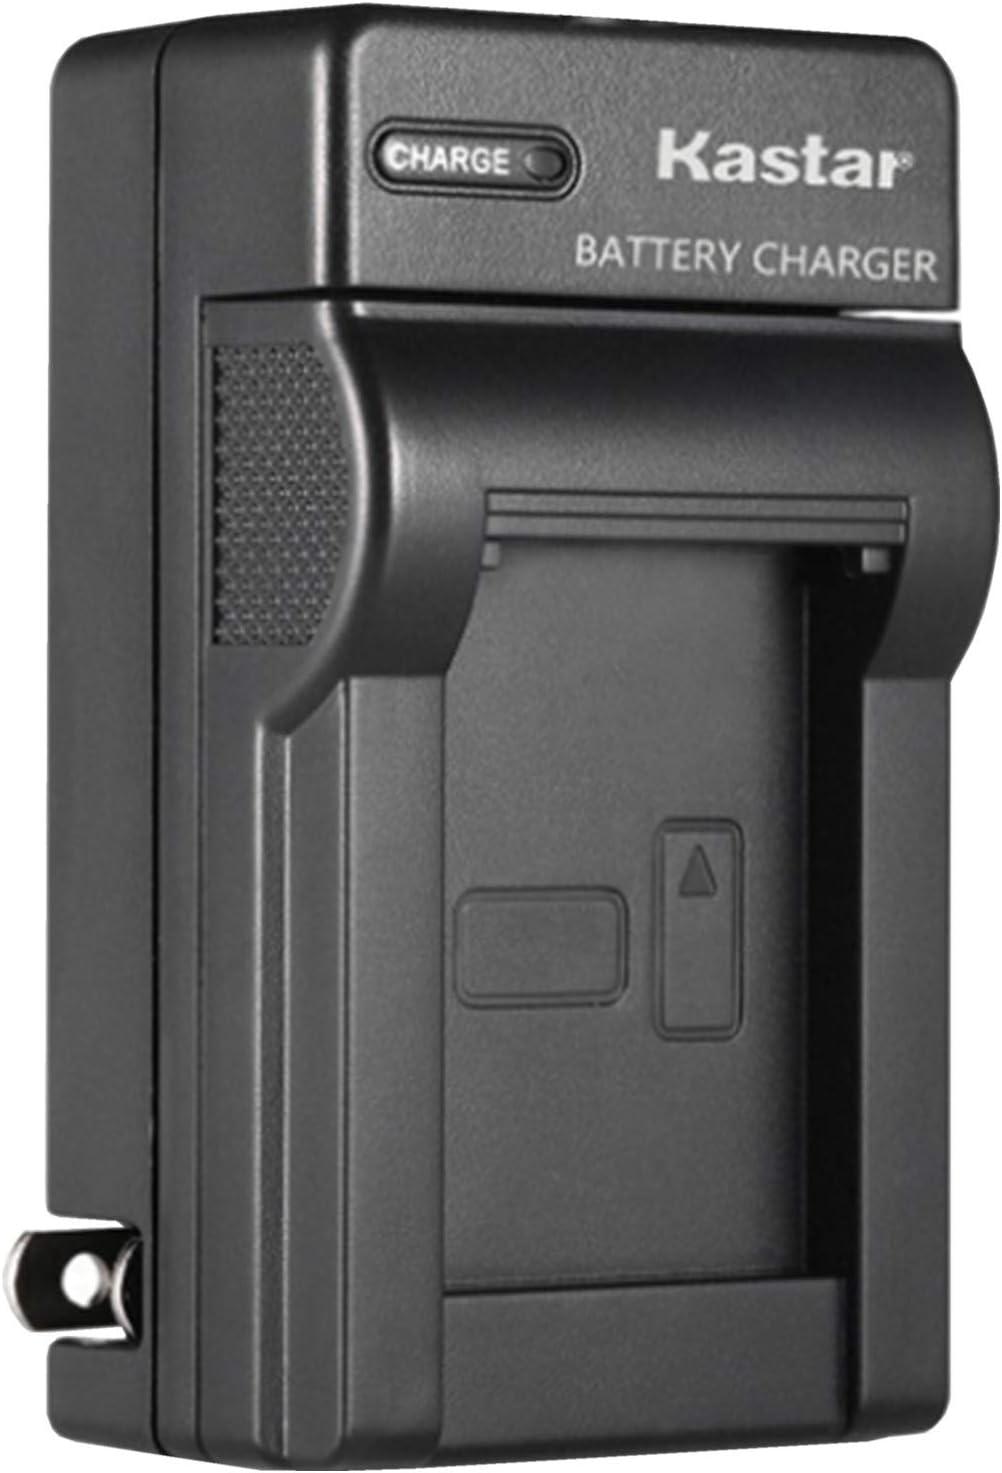 Philadelphia Mall Kastar Charger for Casio NP20 Exilim High material EX-S1 EX-M1 EX-M2 EX EX-M20